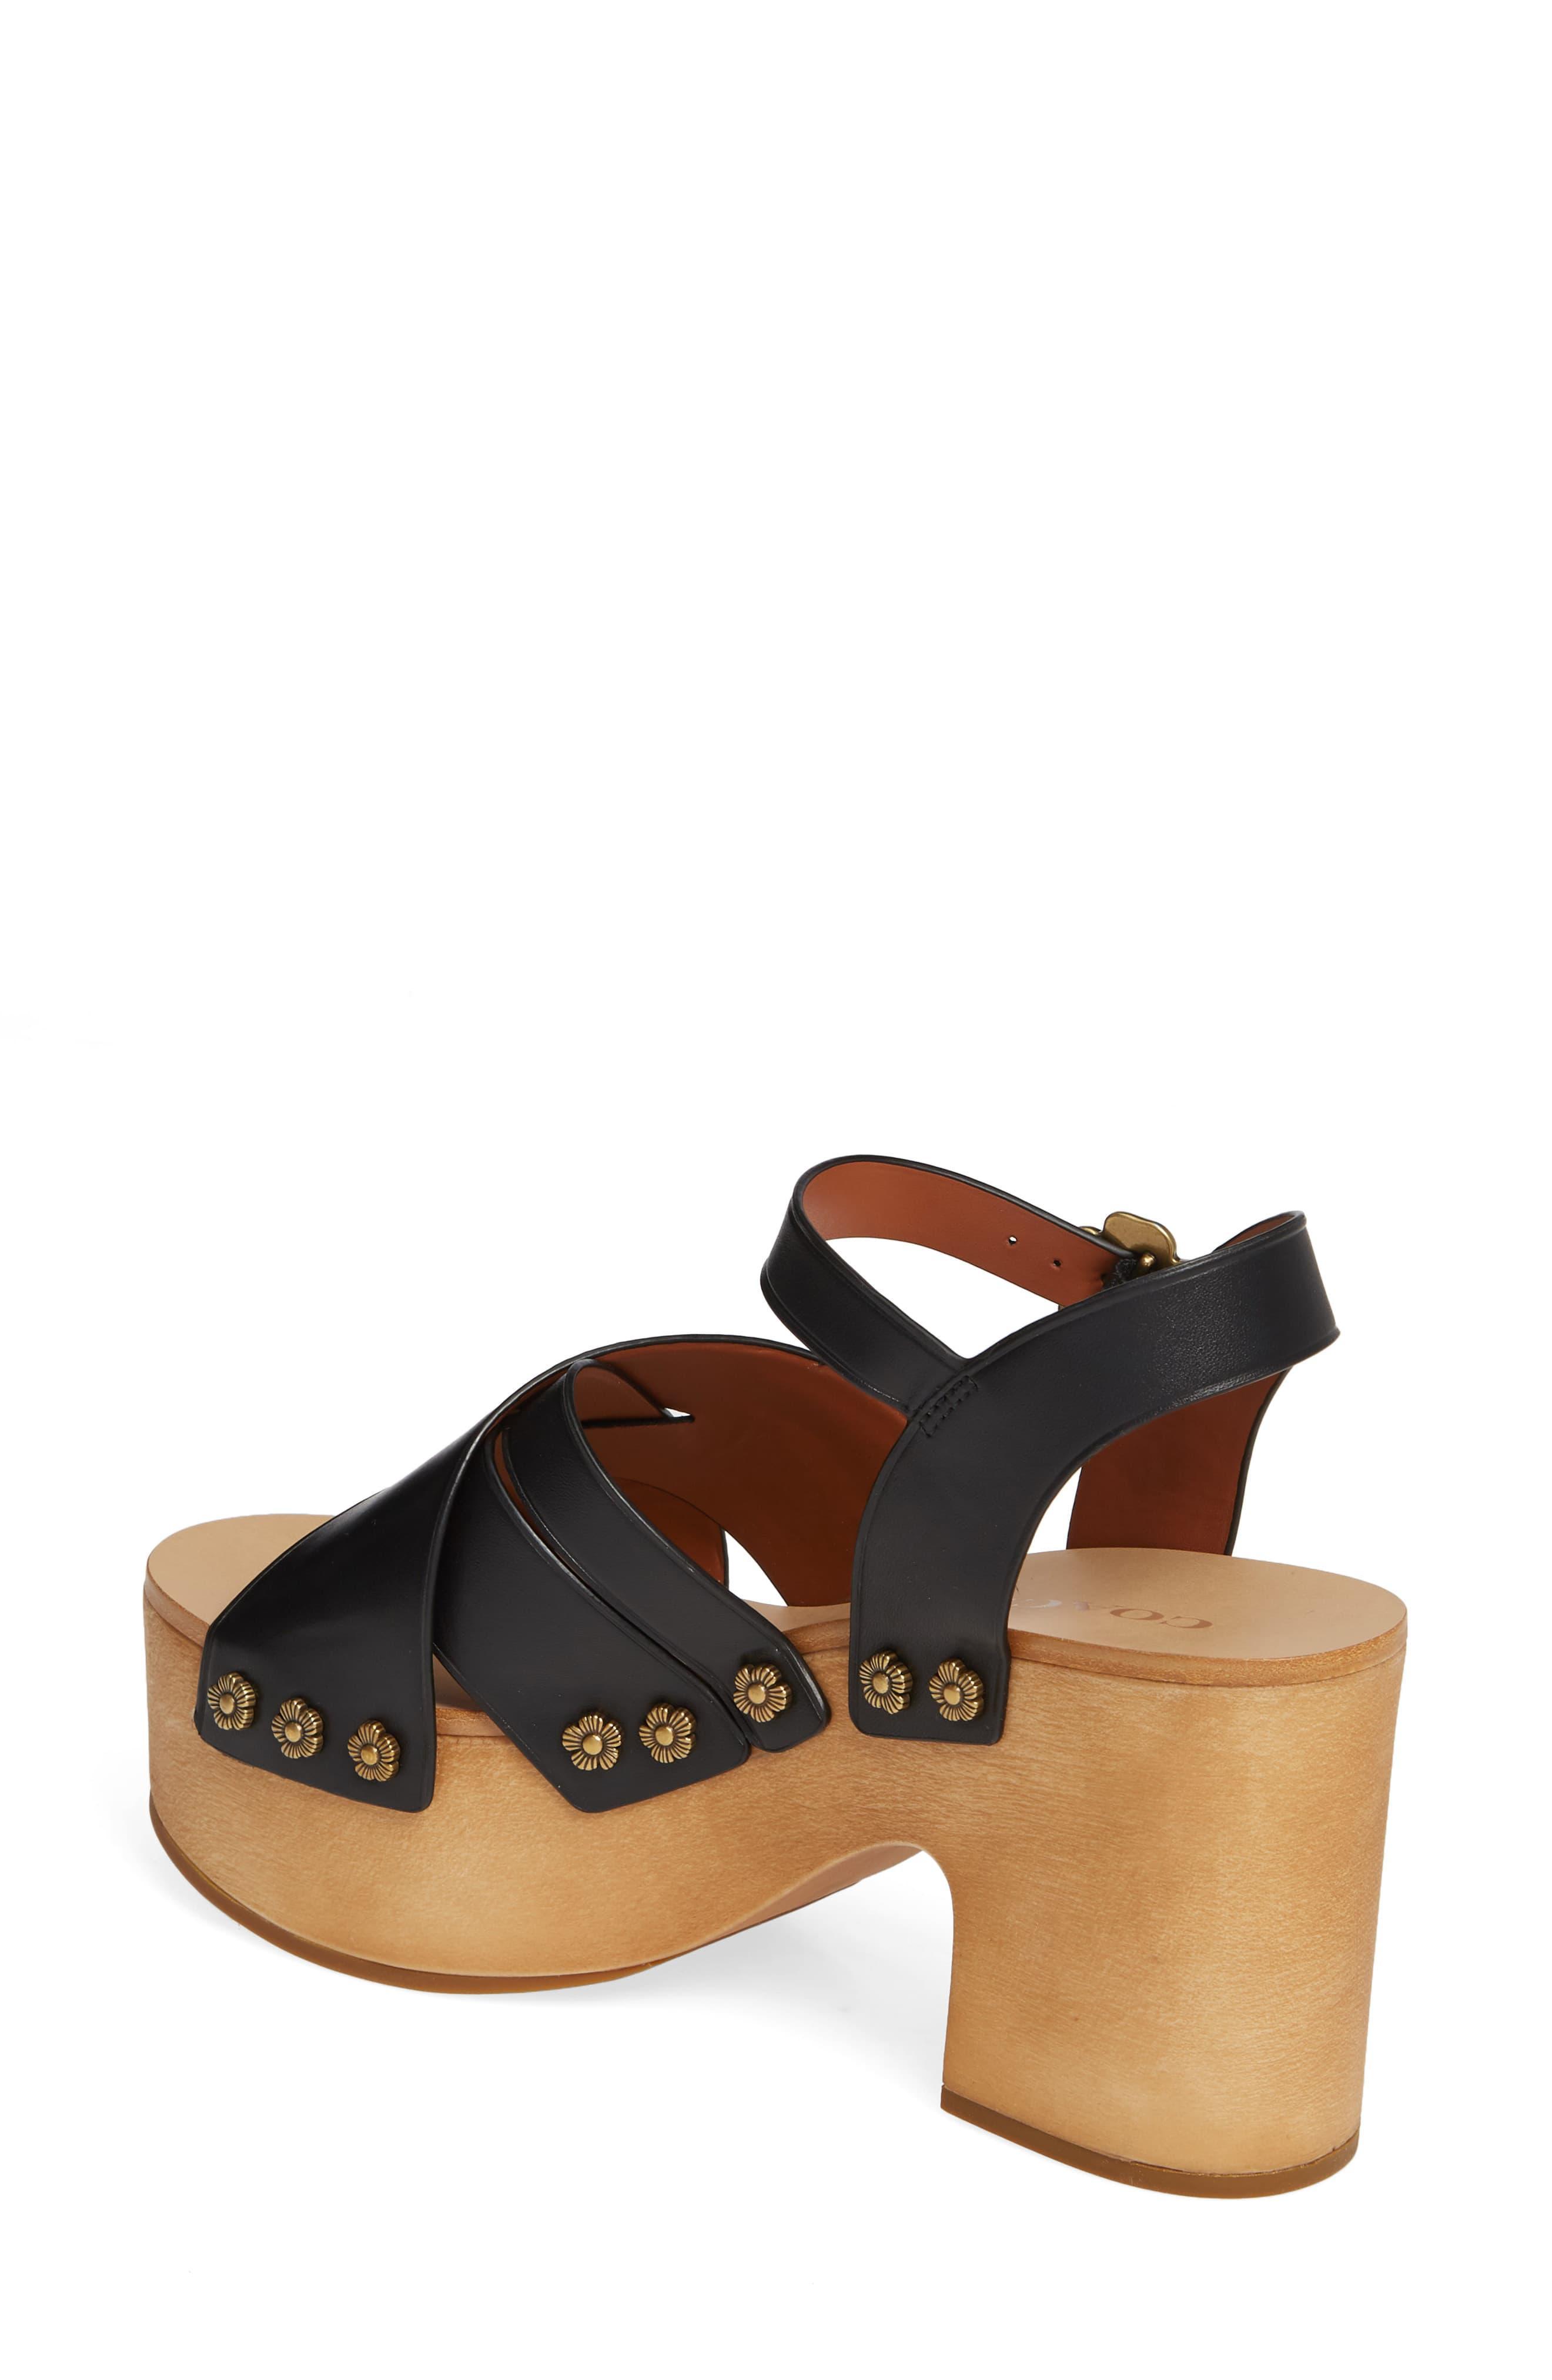 afd62a771b COACH Nessa Clog Platform Sandal in Black - Save 50% - Lyst